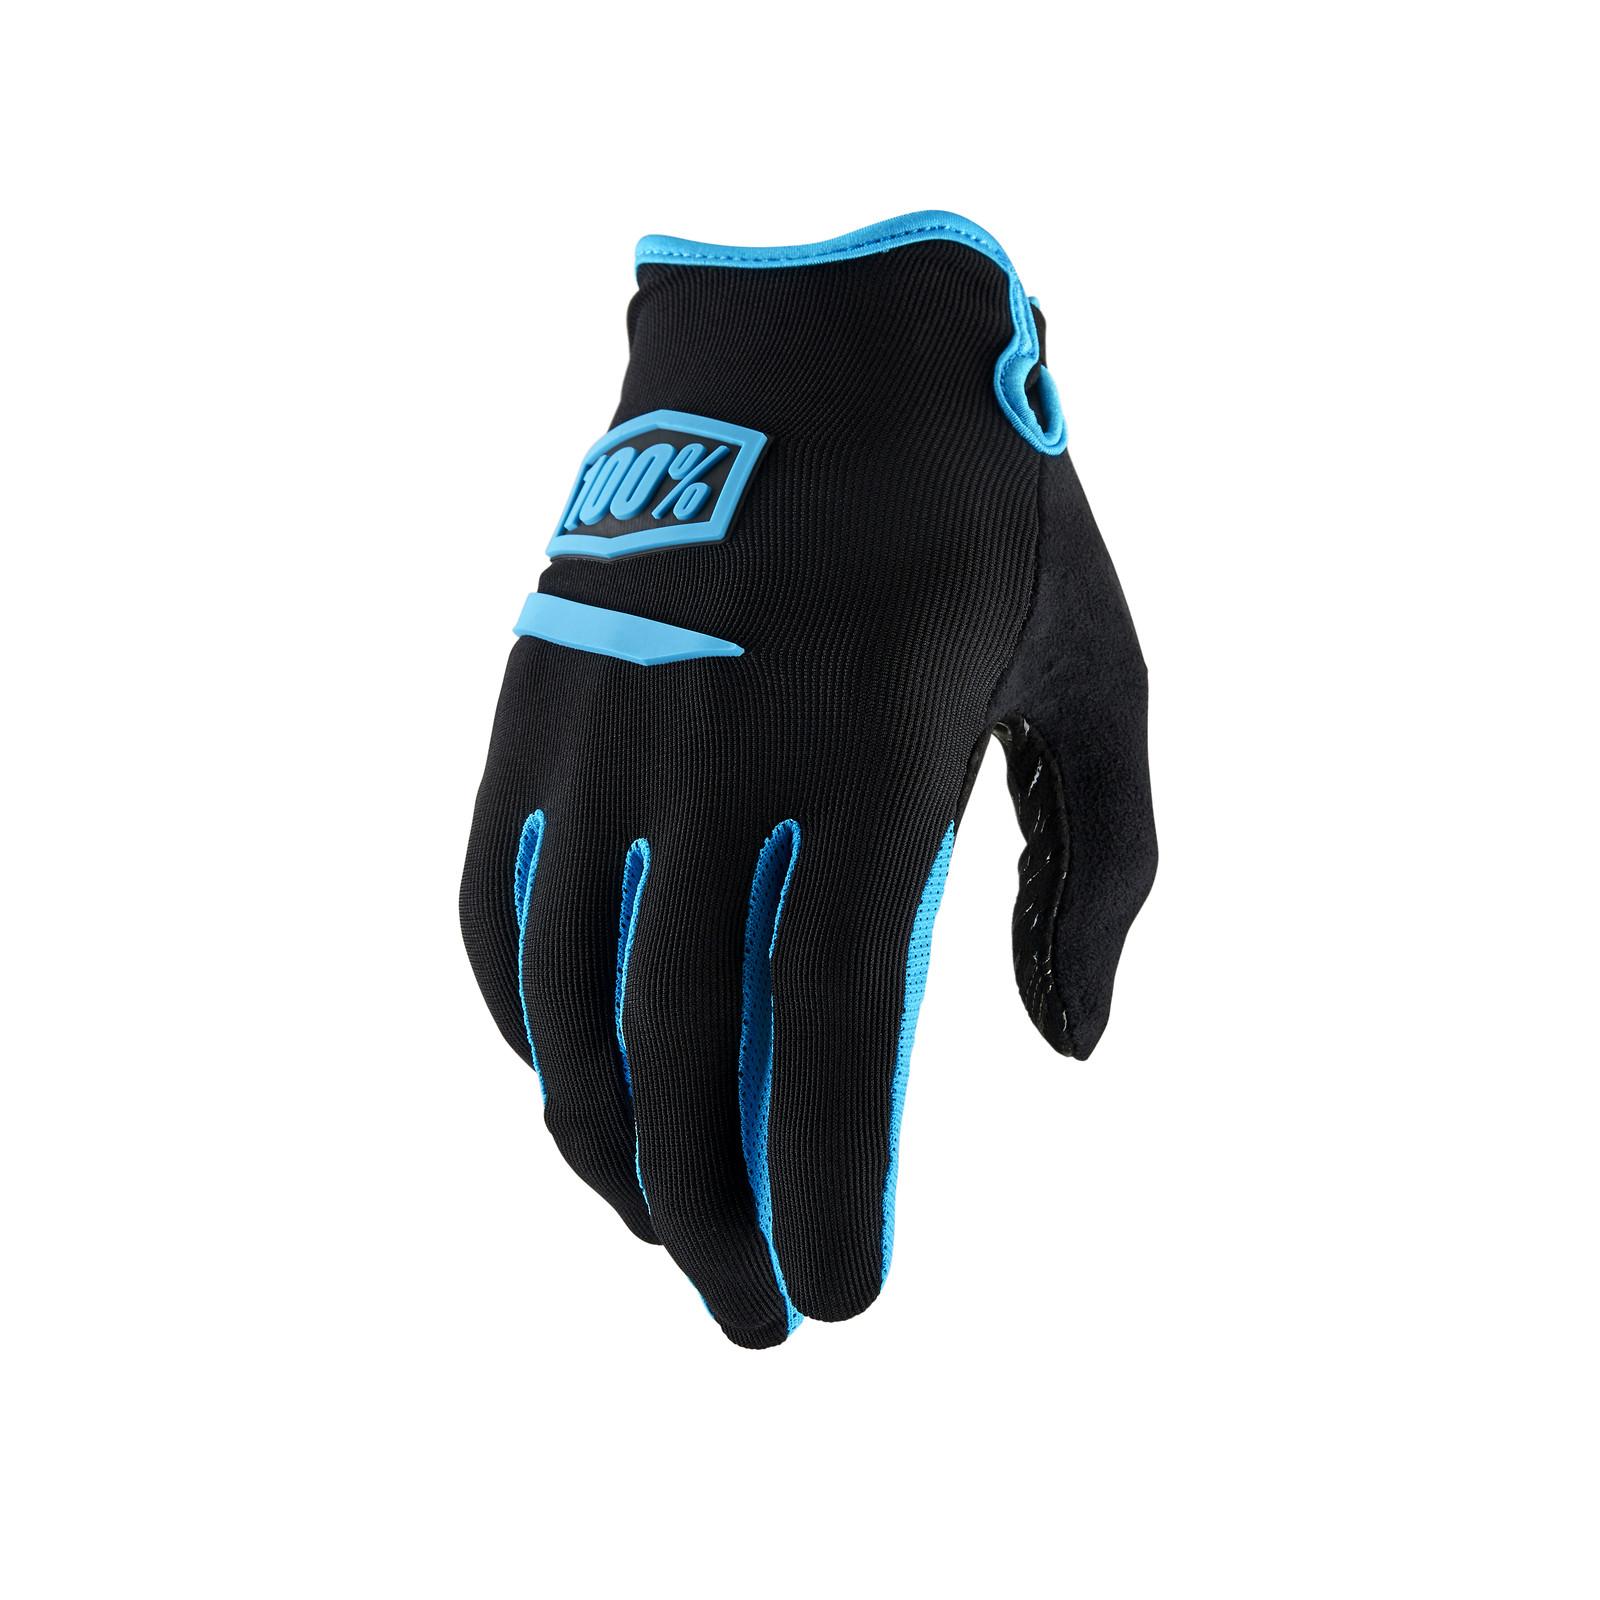 Ridecamp Glove - Black / Blue - 100percent - Mountain Biking Pictures - Vital MTB